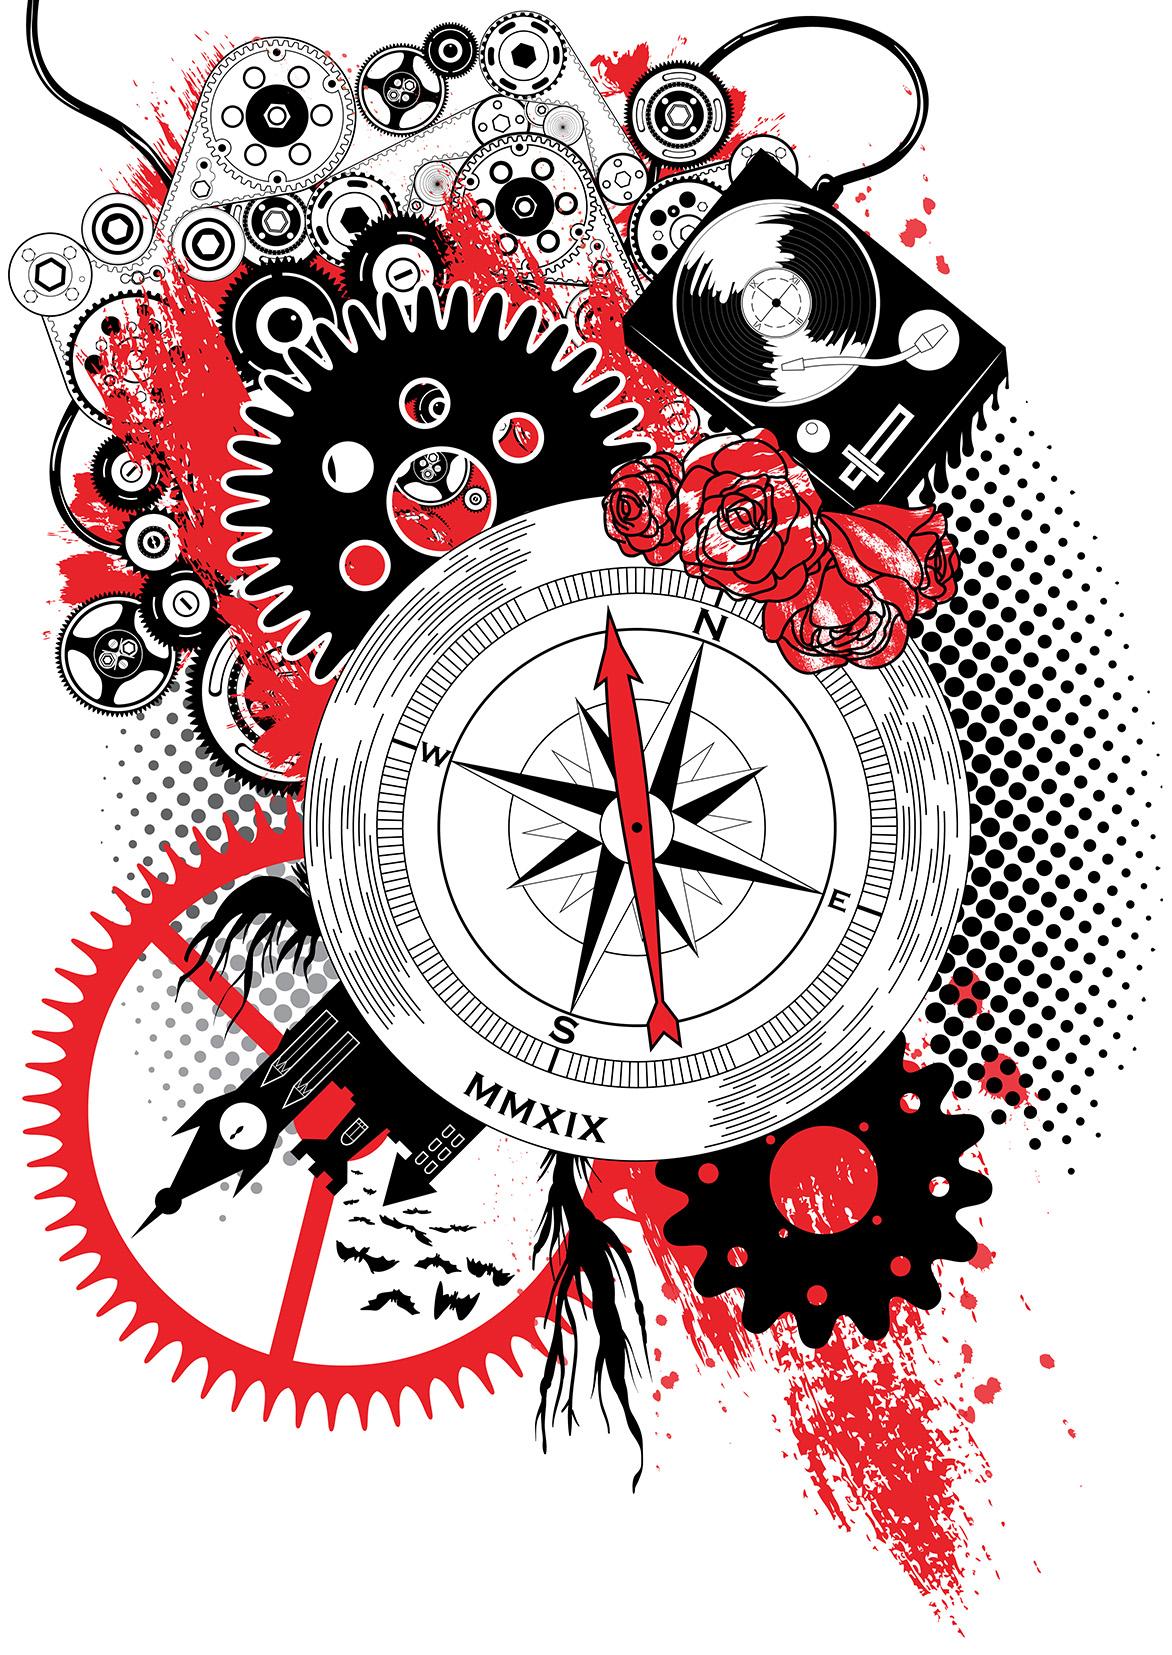 Trash Polka Style Tattoo Illustration